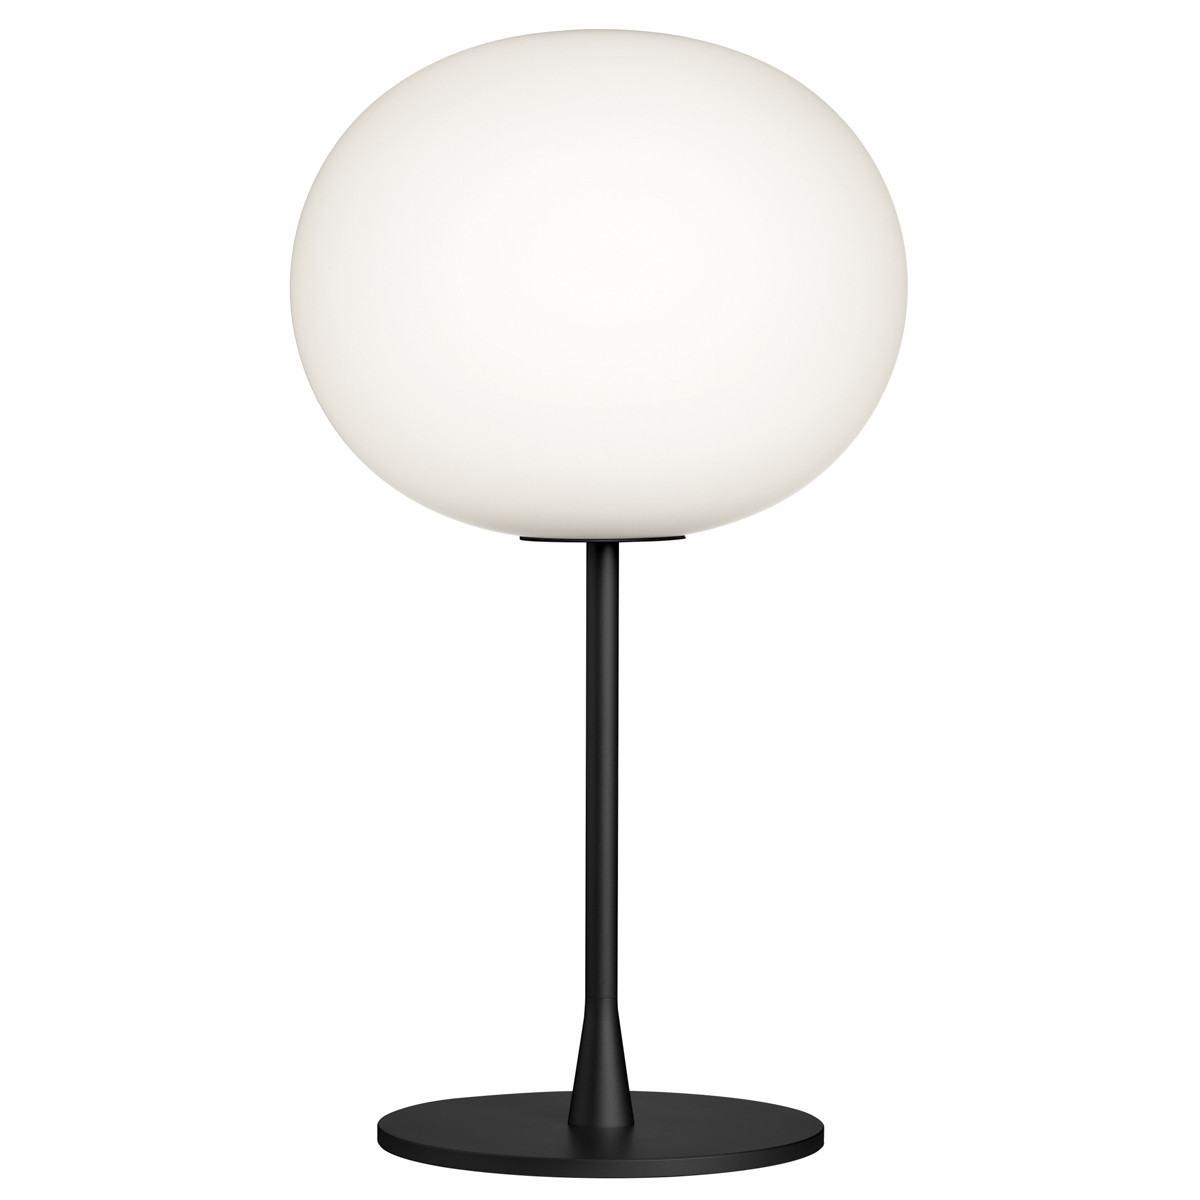 Flos Glo-Ball T Table Lamp - Black